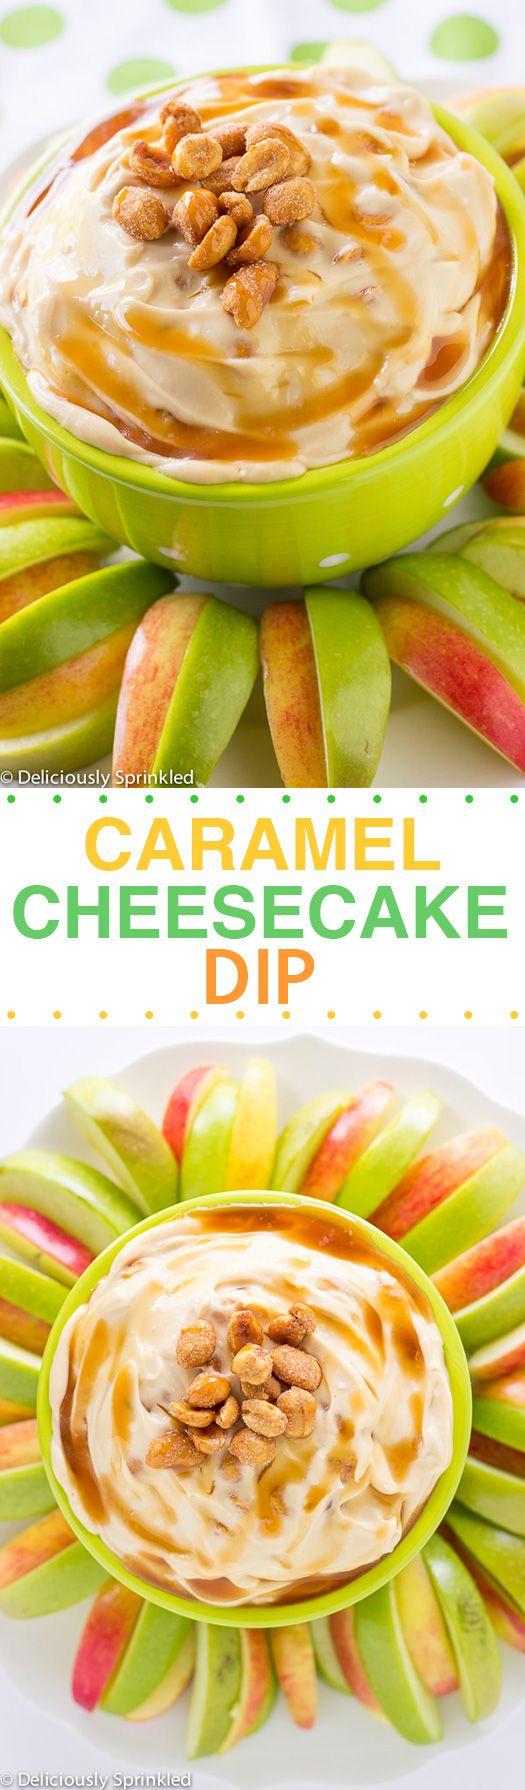 Quick & Easy To Make: Caramel Cheesecake Dip